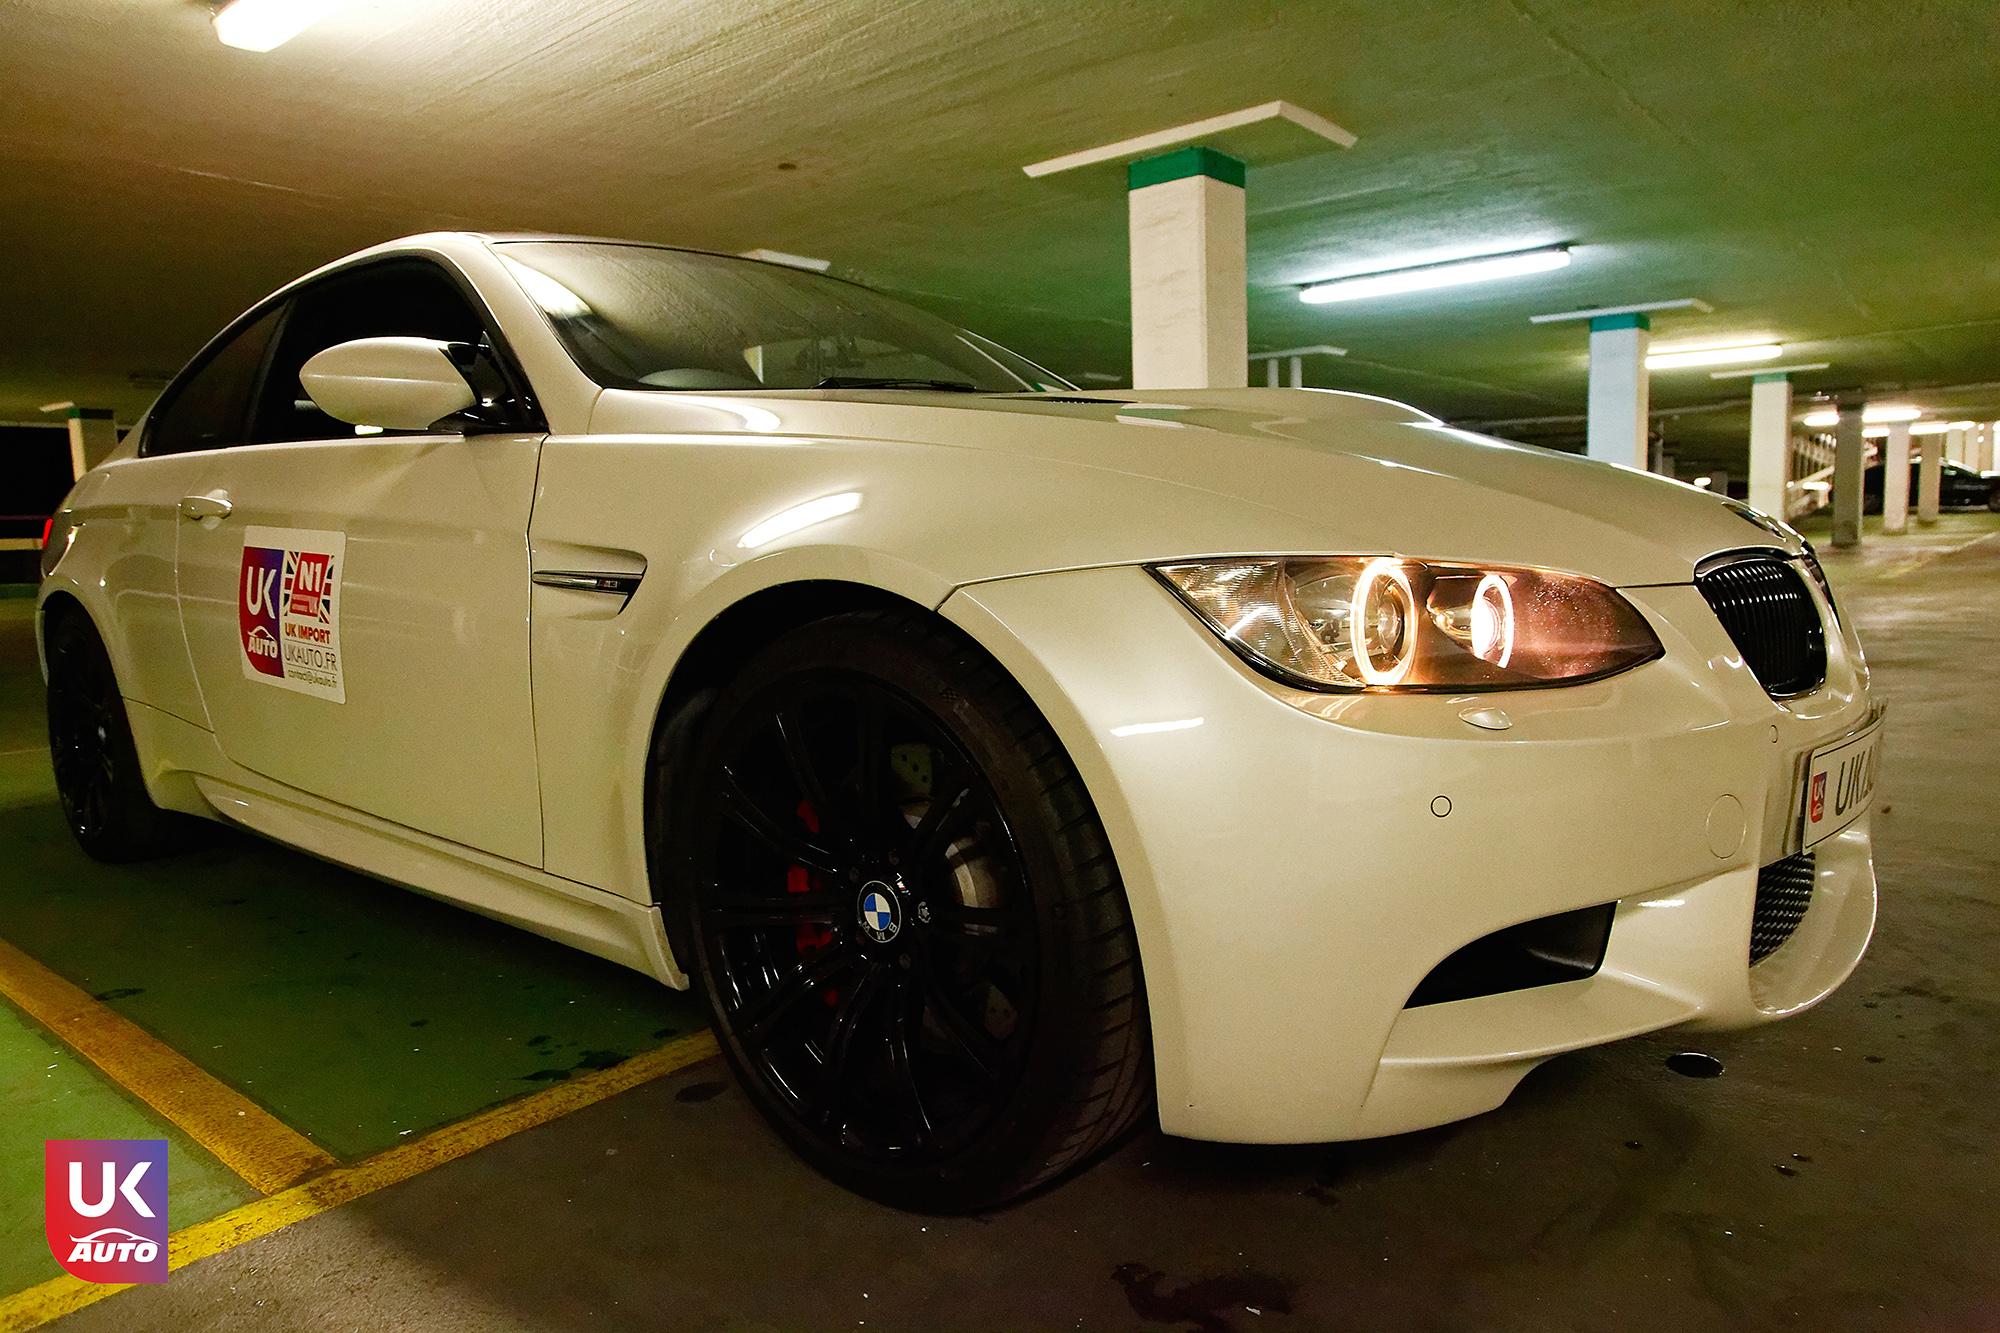 BMW m3 E92 import auto mandataire angleterre uk londres bmw leboncoin achat angleterre bmw voiture anglaise auto rhd e92 uk auto3 - Felecitation a Clement pour cette BMW M3 E92 COUPE RHD PACK CARBON BMW ANGLETERRE VOITURE UK